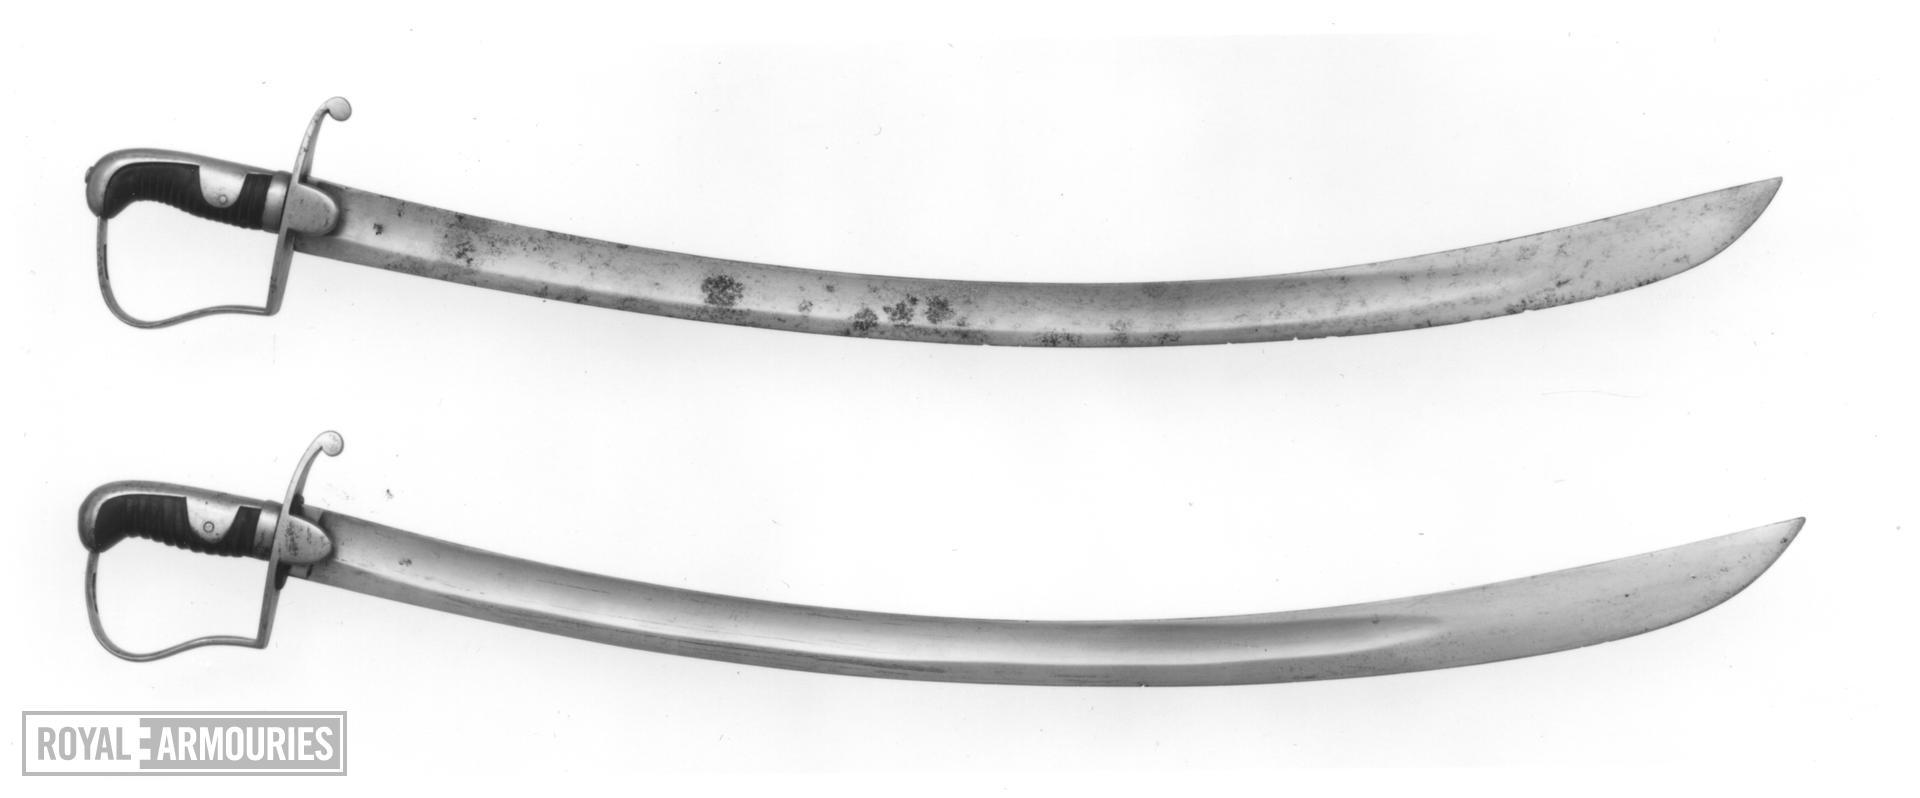 Sword - Pattern 1796 Light Cavalry Trooper's sword